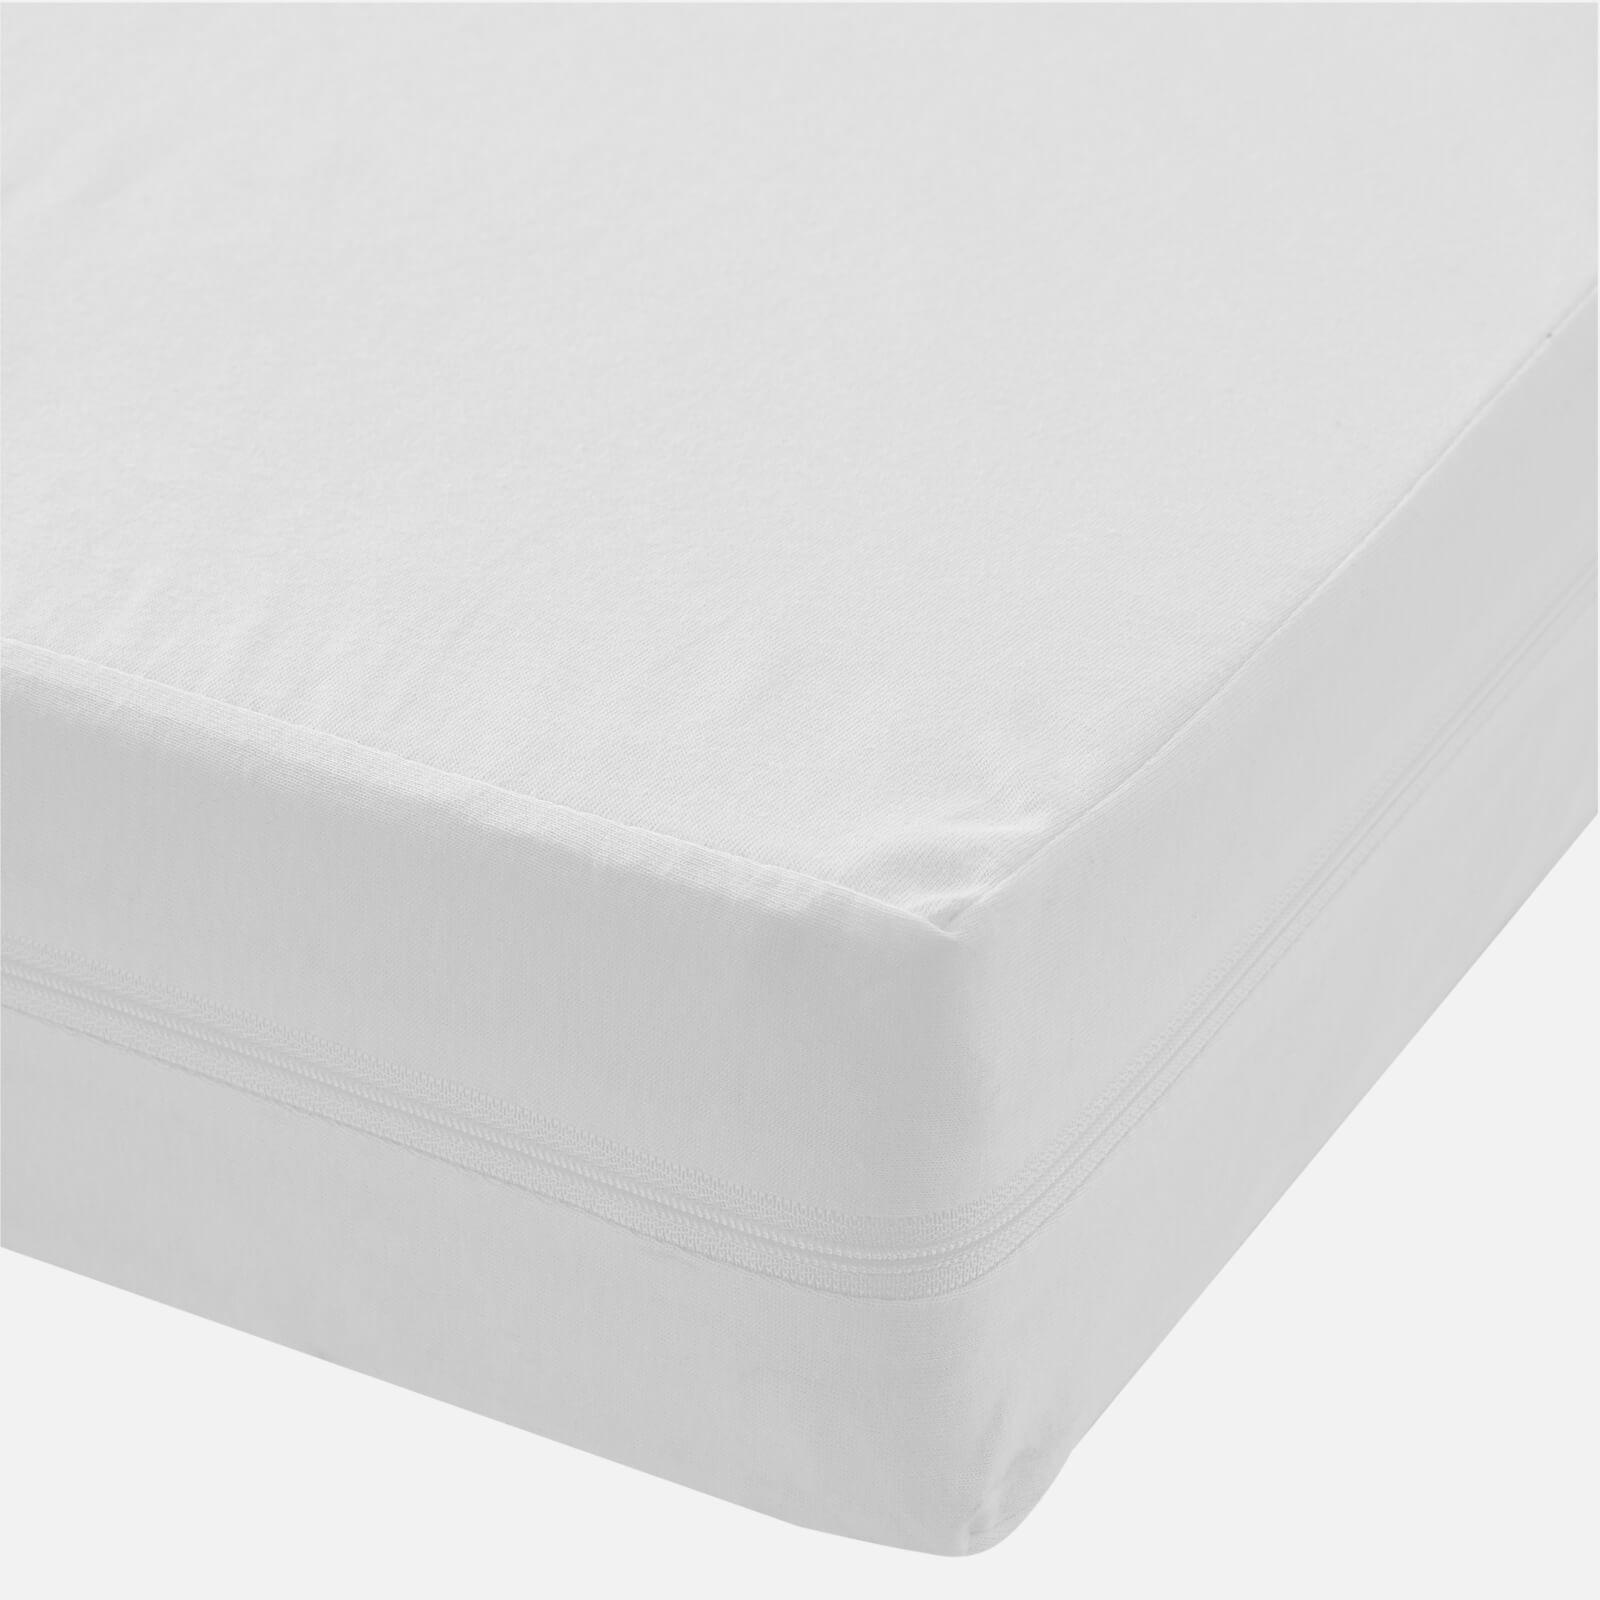 in homeware Anti-Allergy Mattress Protector - White - Cot